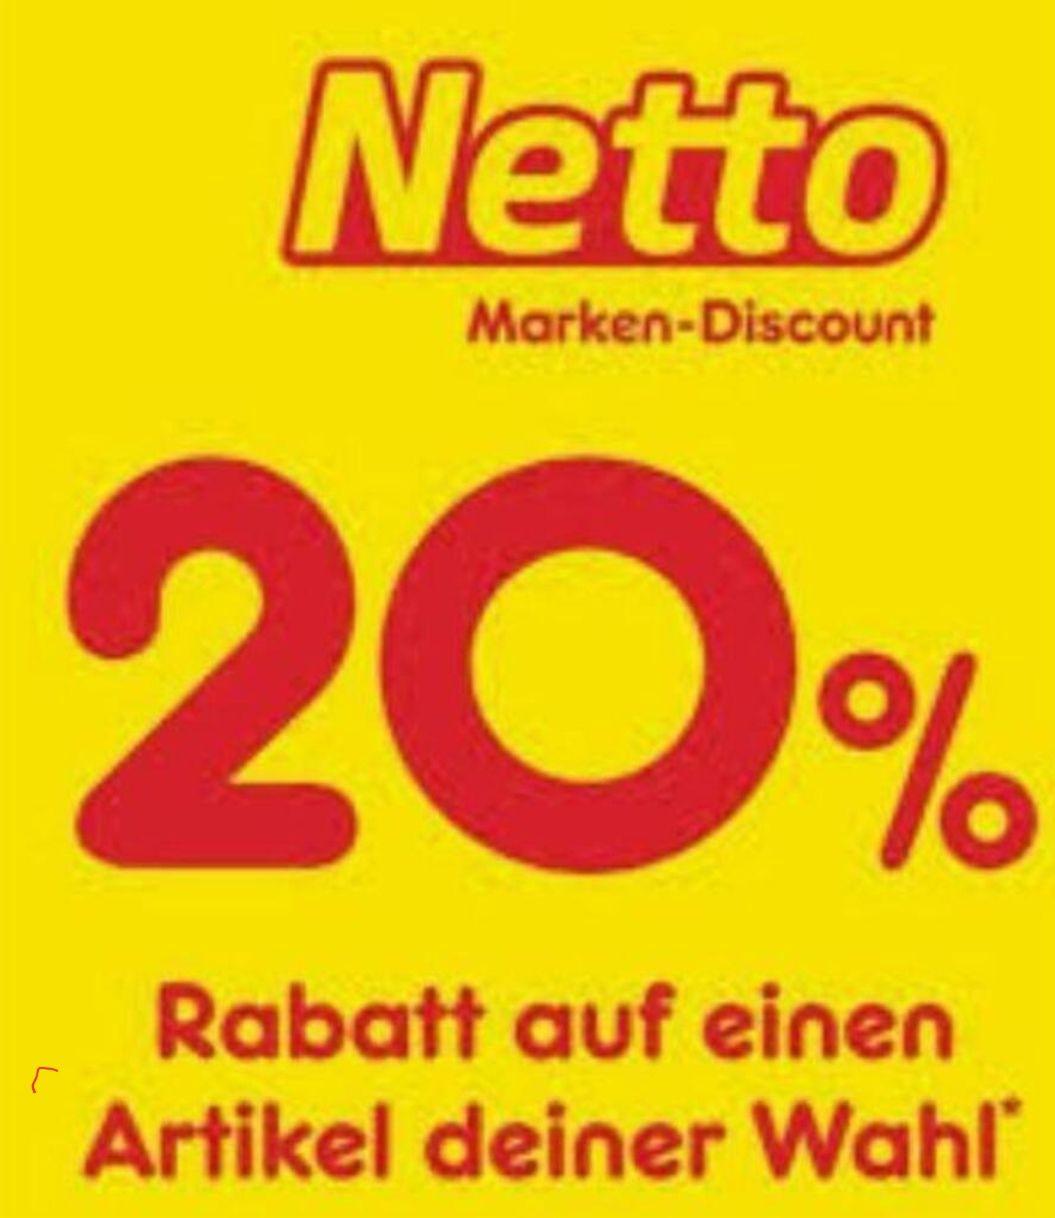 [Netto MD] Rabatt Coupons KW10 (08.03. - 13.03.), bundesweit einsetzbar